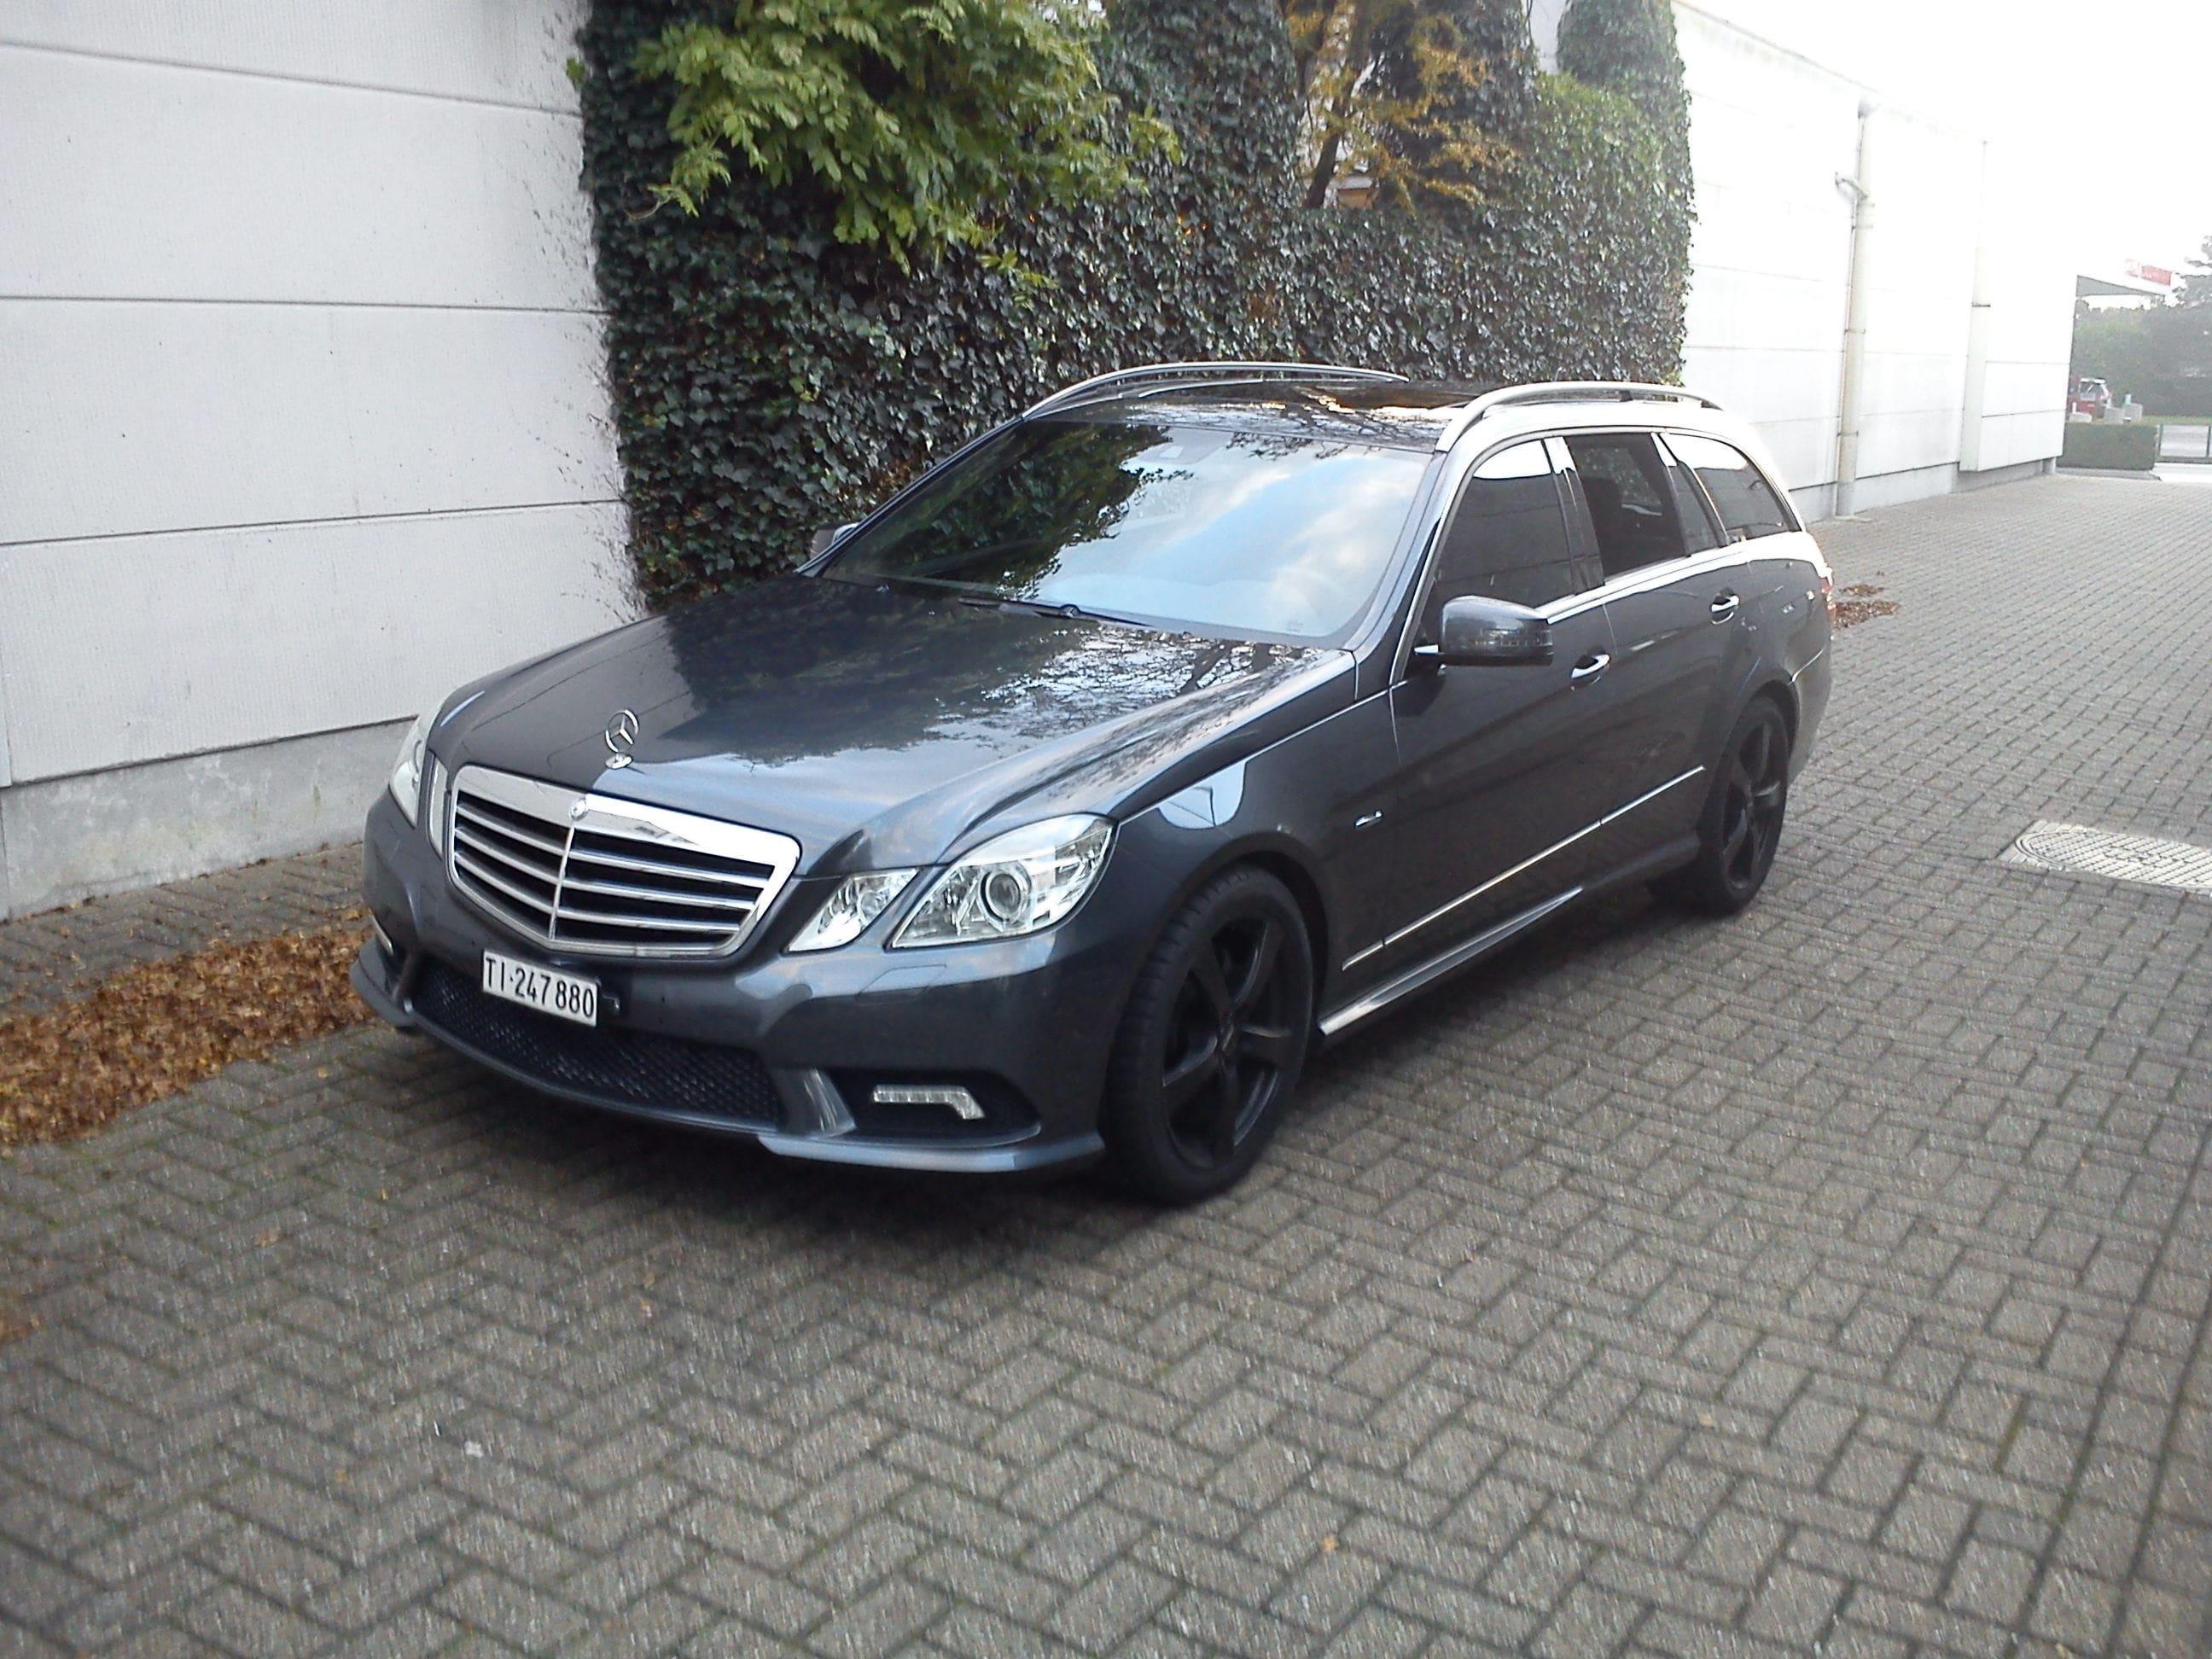 Mercedes E320 met Mat Zwarte Wrap, Carwrapping door Wrapmyride.nu Foto-nr:6223, ©2021